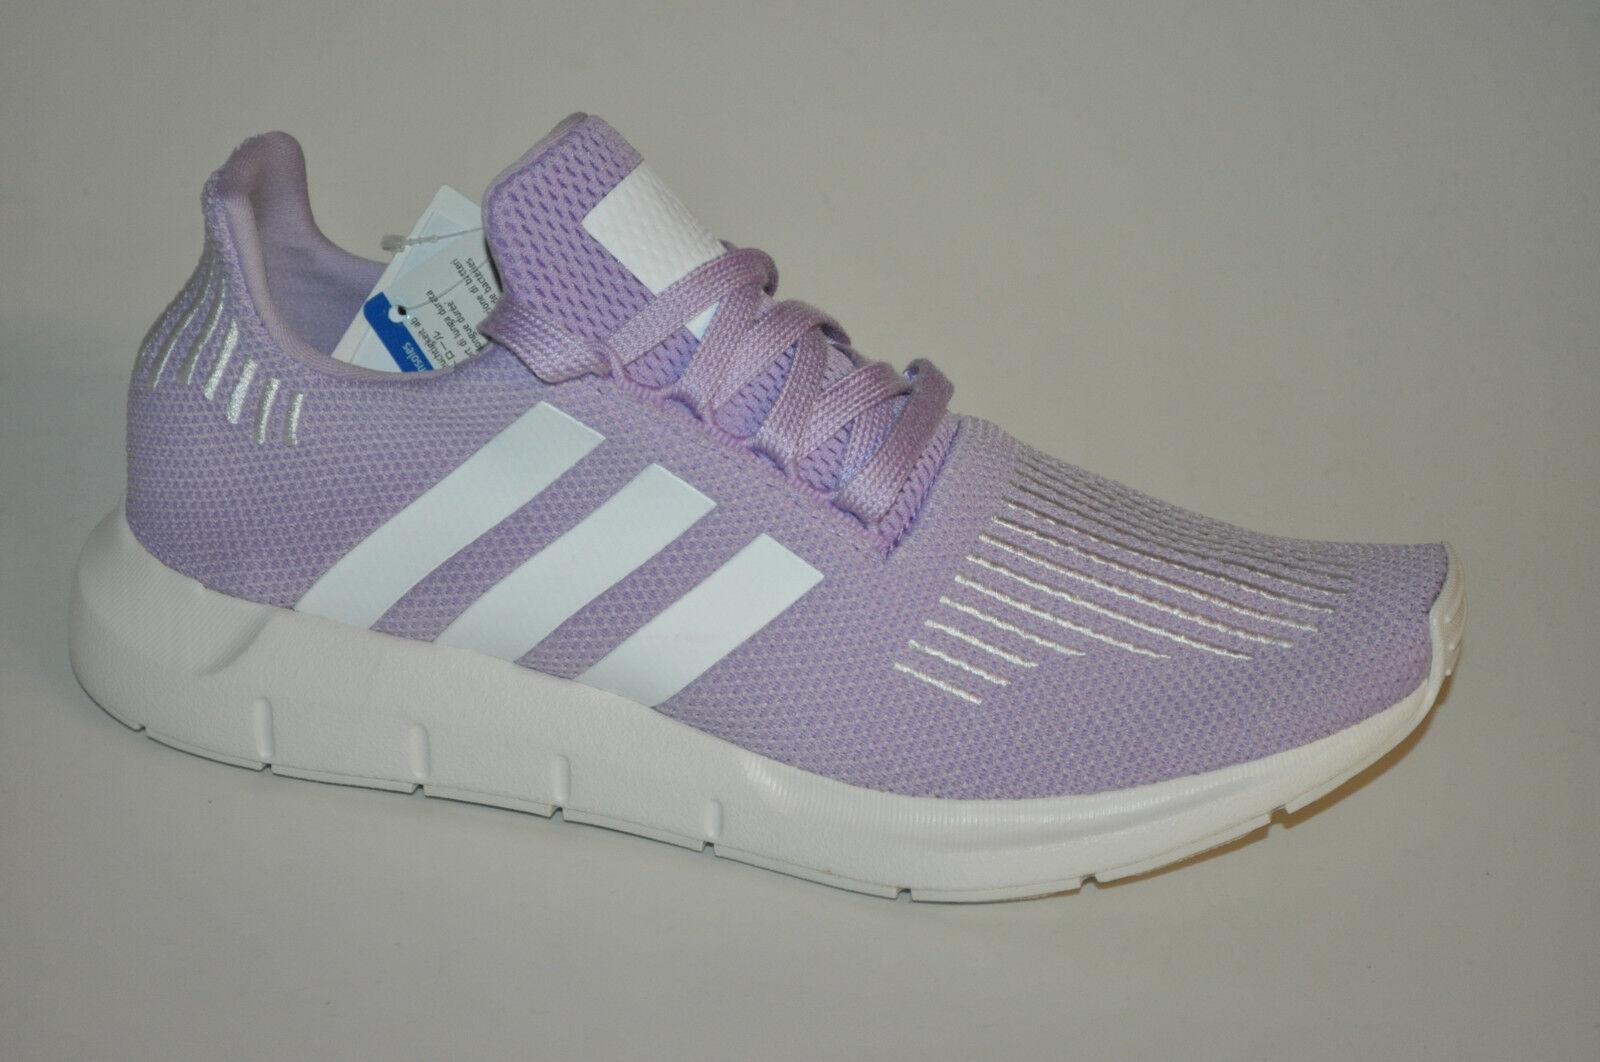 Adidas Swift Run Purple DA8729 PURGLO FTWWHT CRYWHT Purple Run b11317